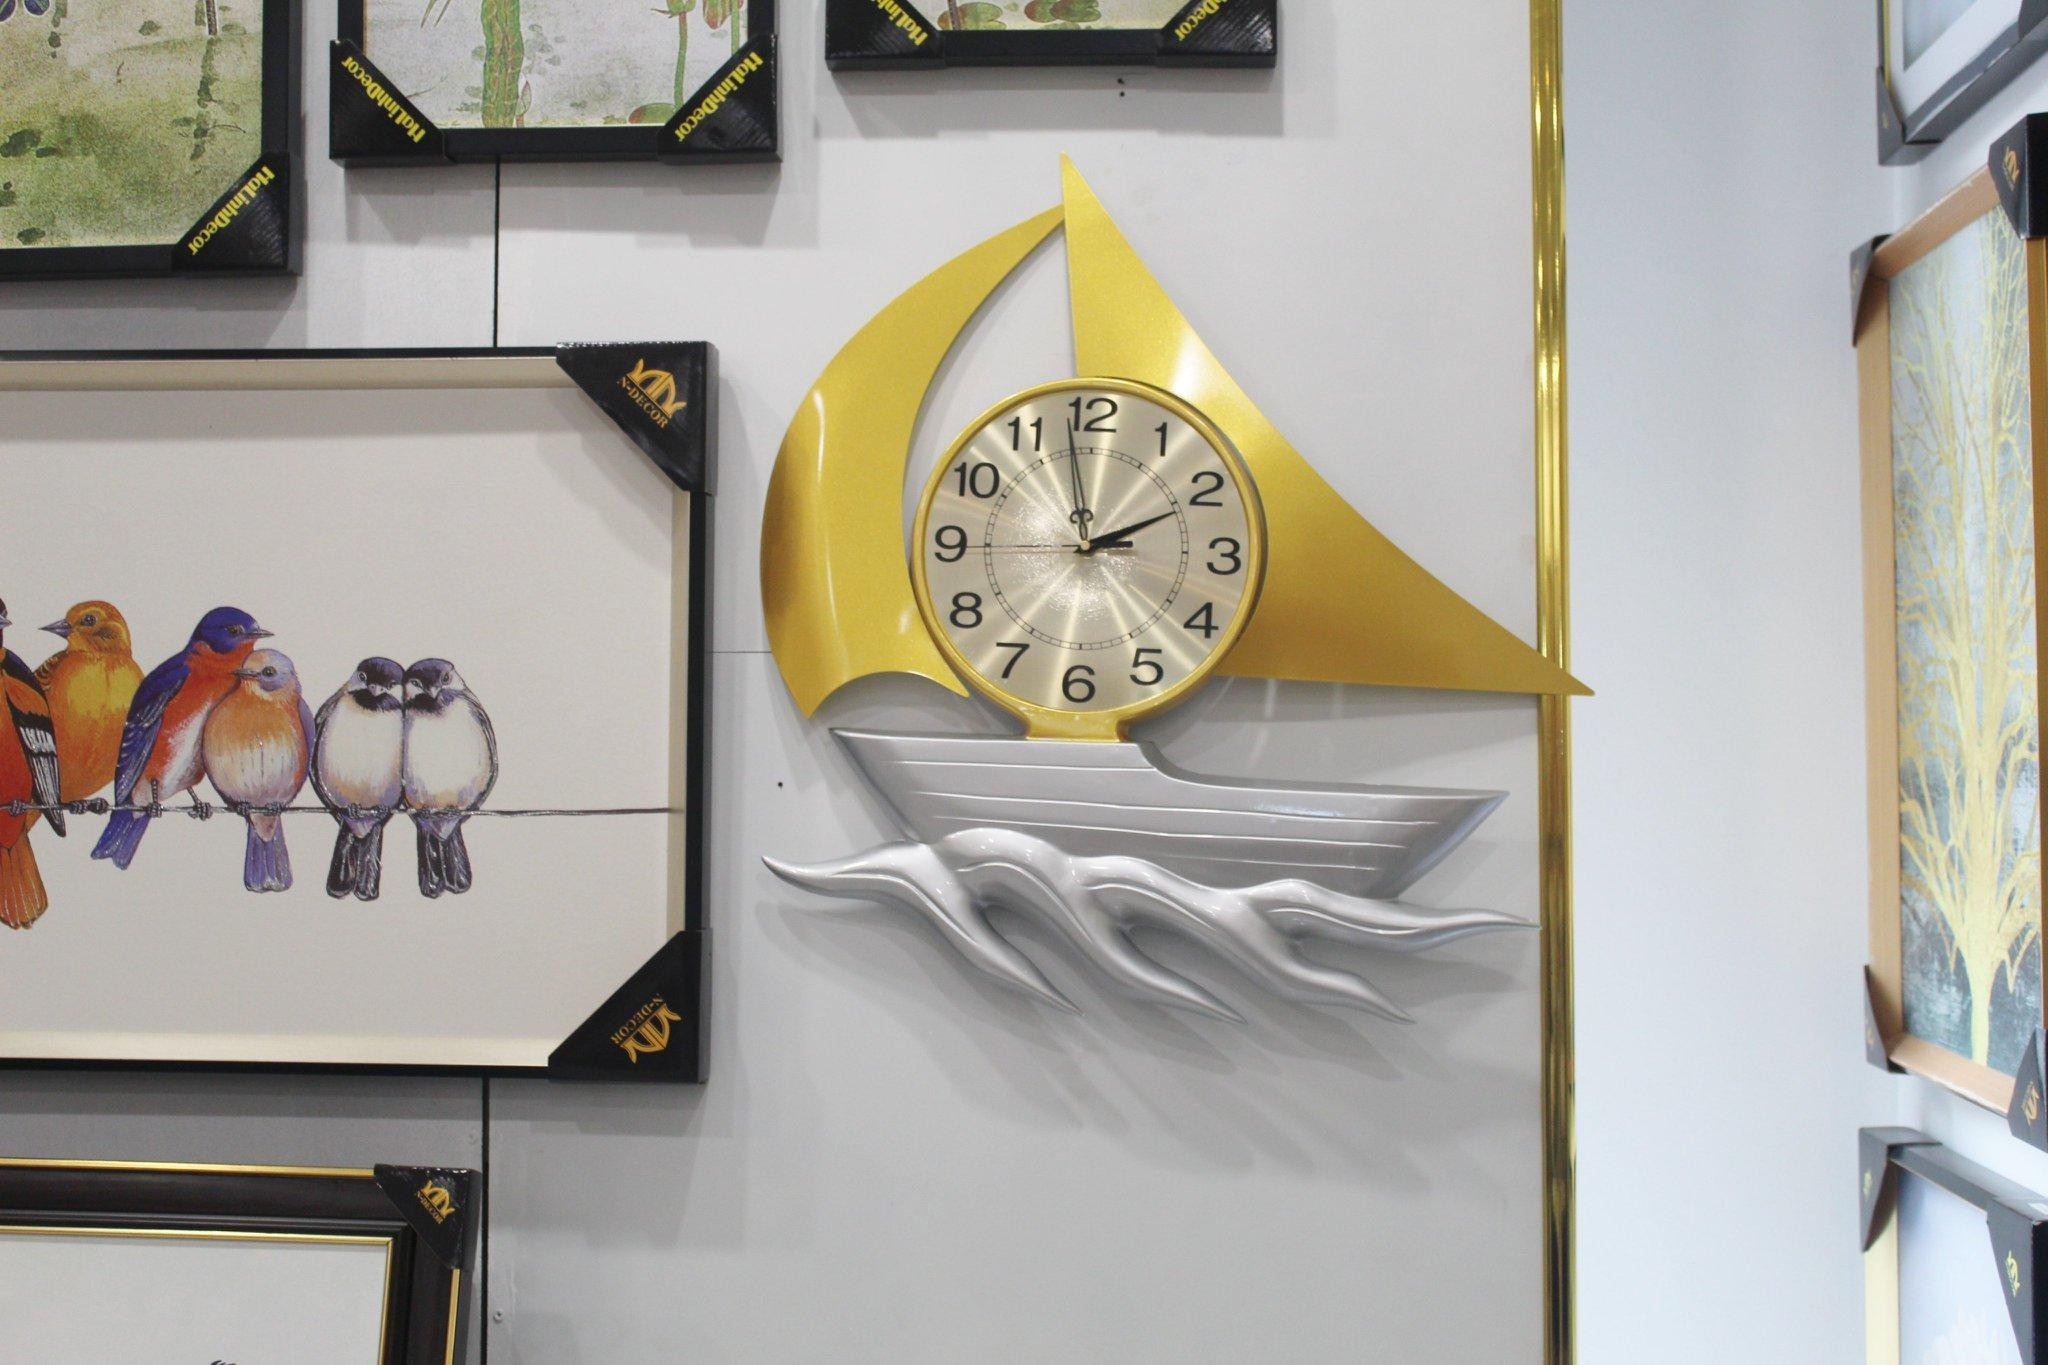 Đồng hồ decor thuyền buồm - silver